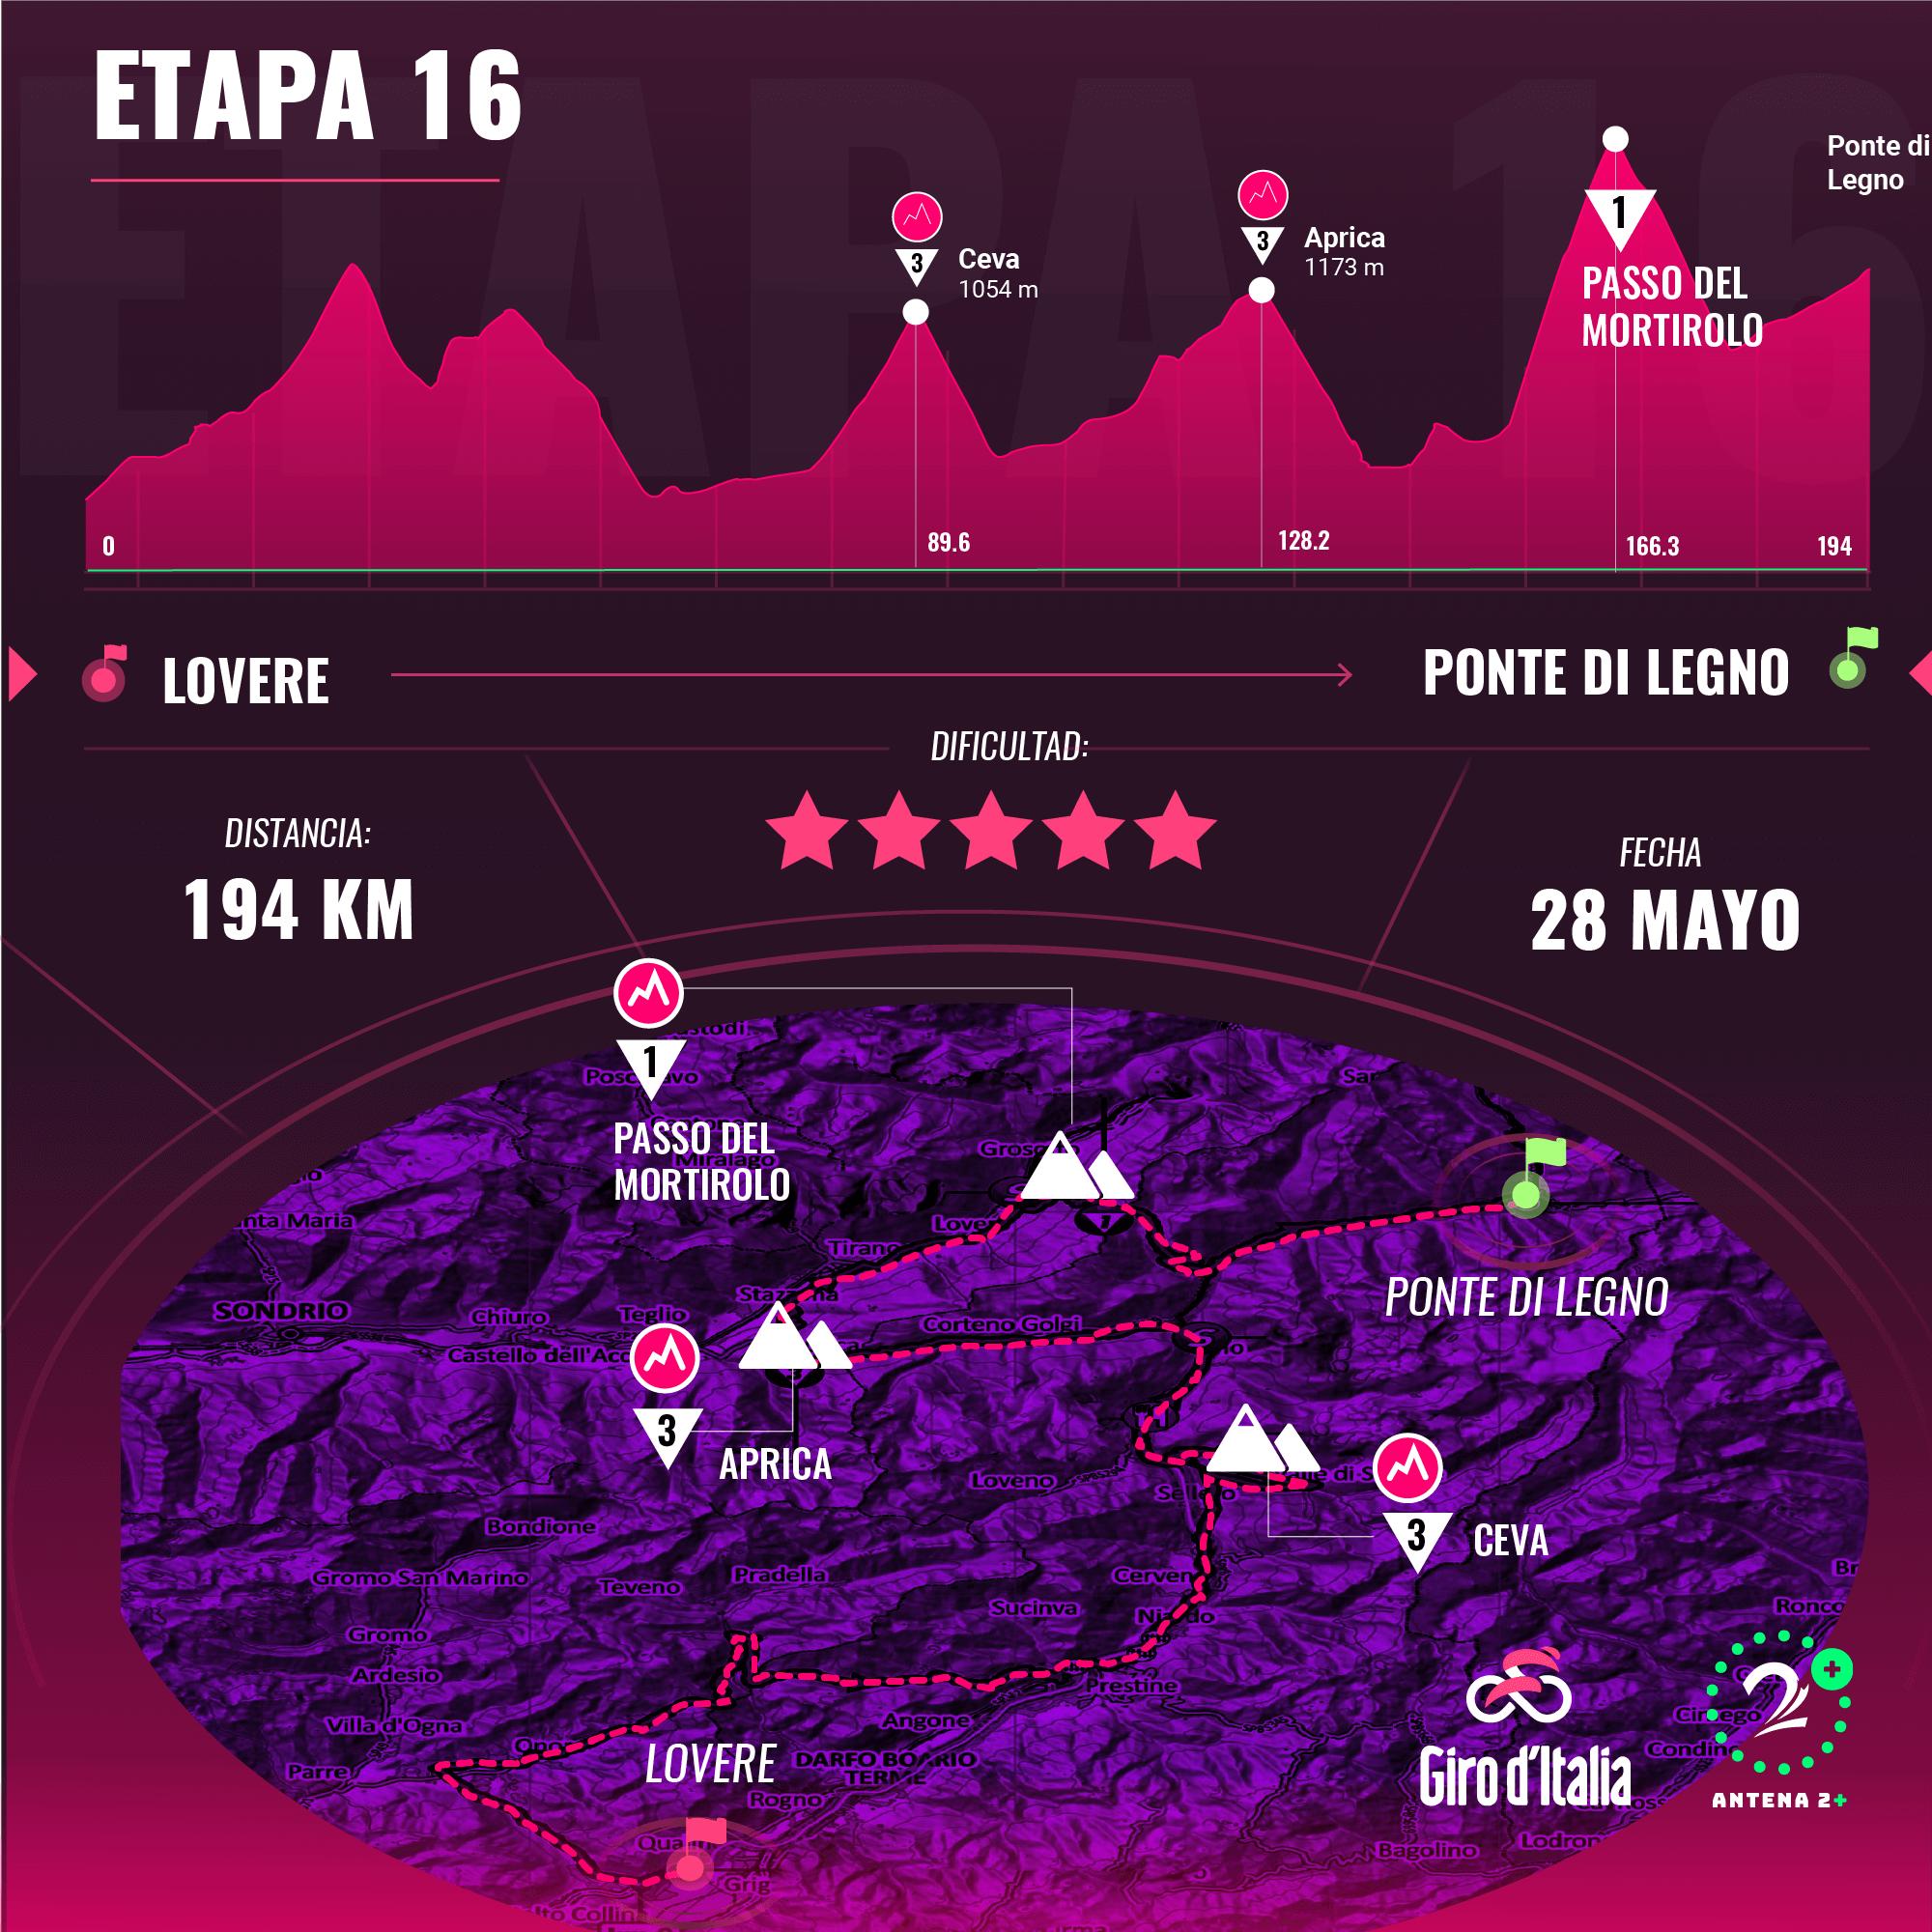 Etapa 16 Giro de Italia